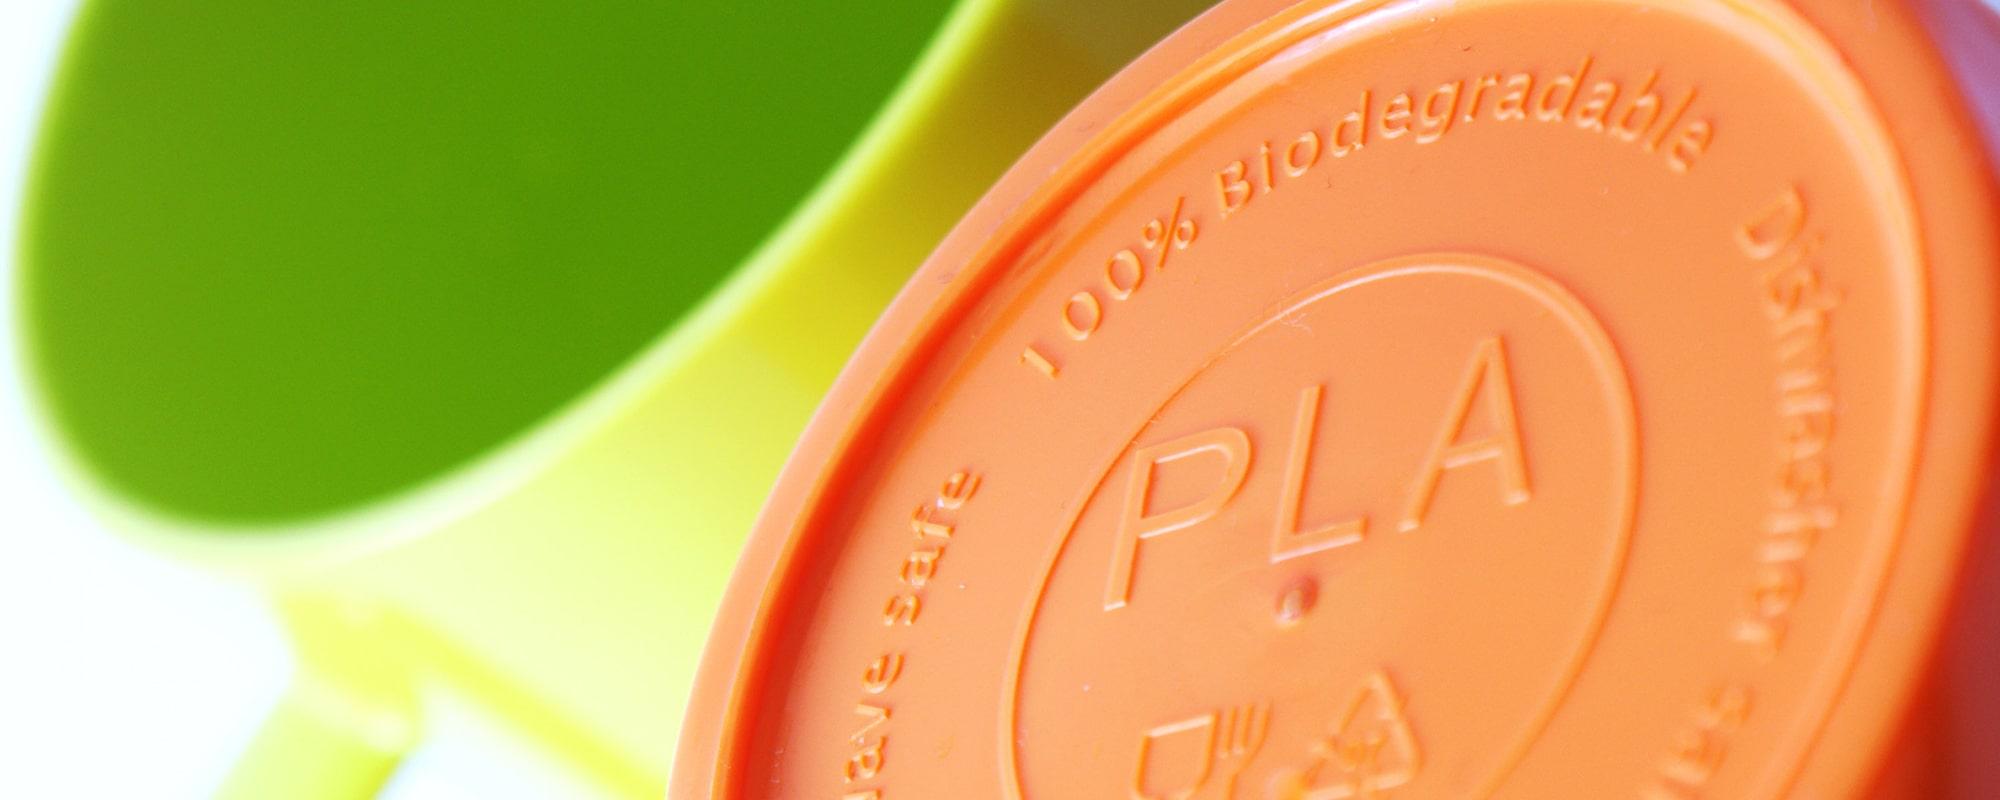 pla sustainable bioplastic